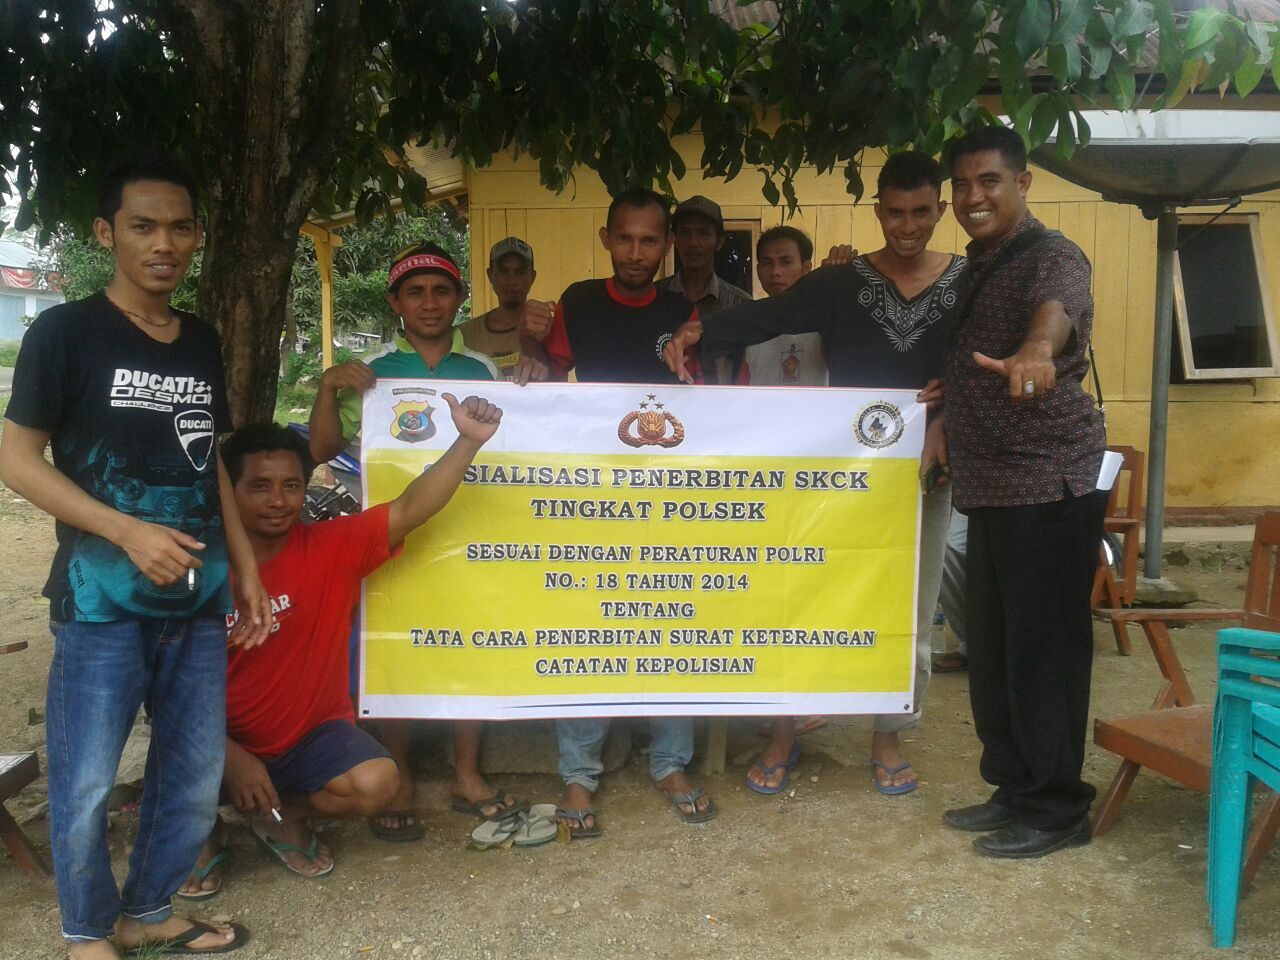 Kepolisan Sektor Komodo Sosialisasi Pelayanan Penerbitan SKCK